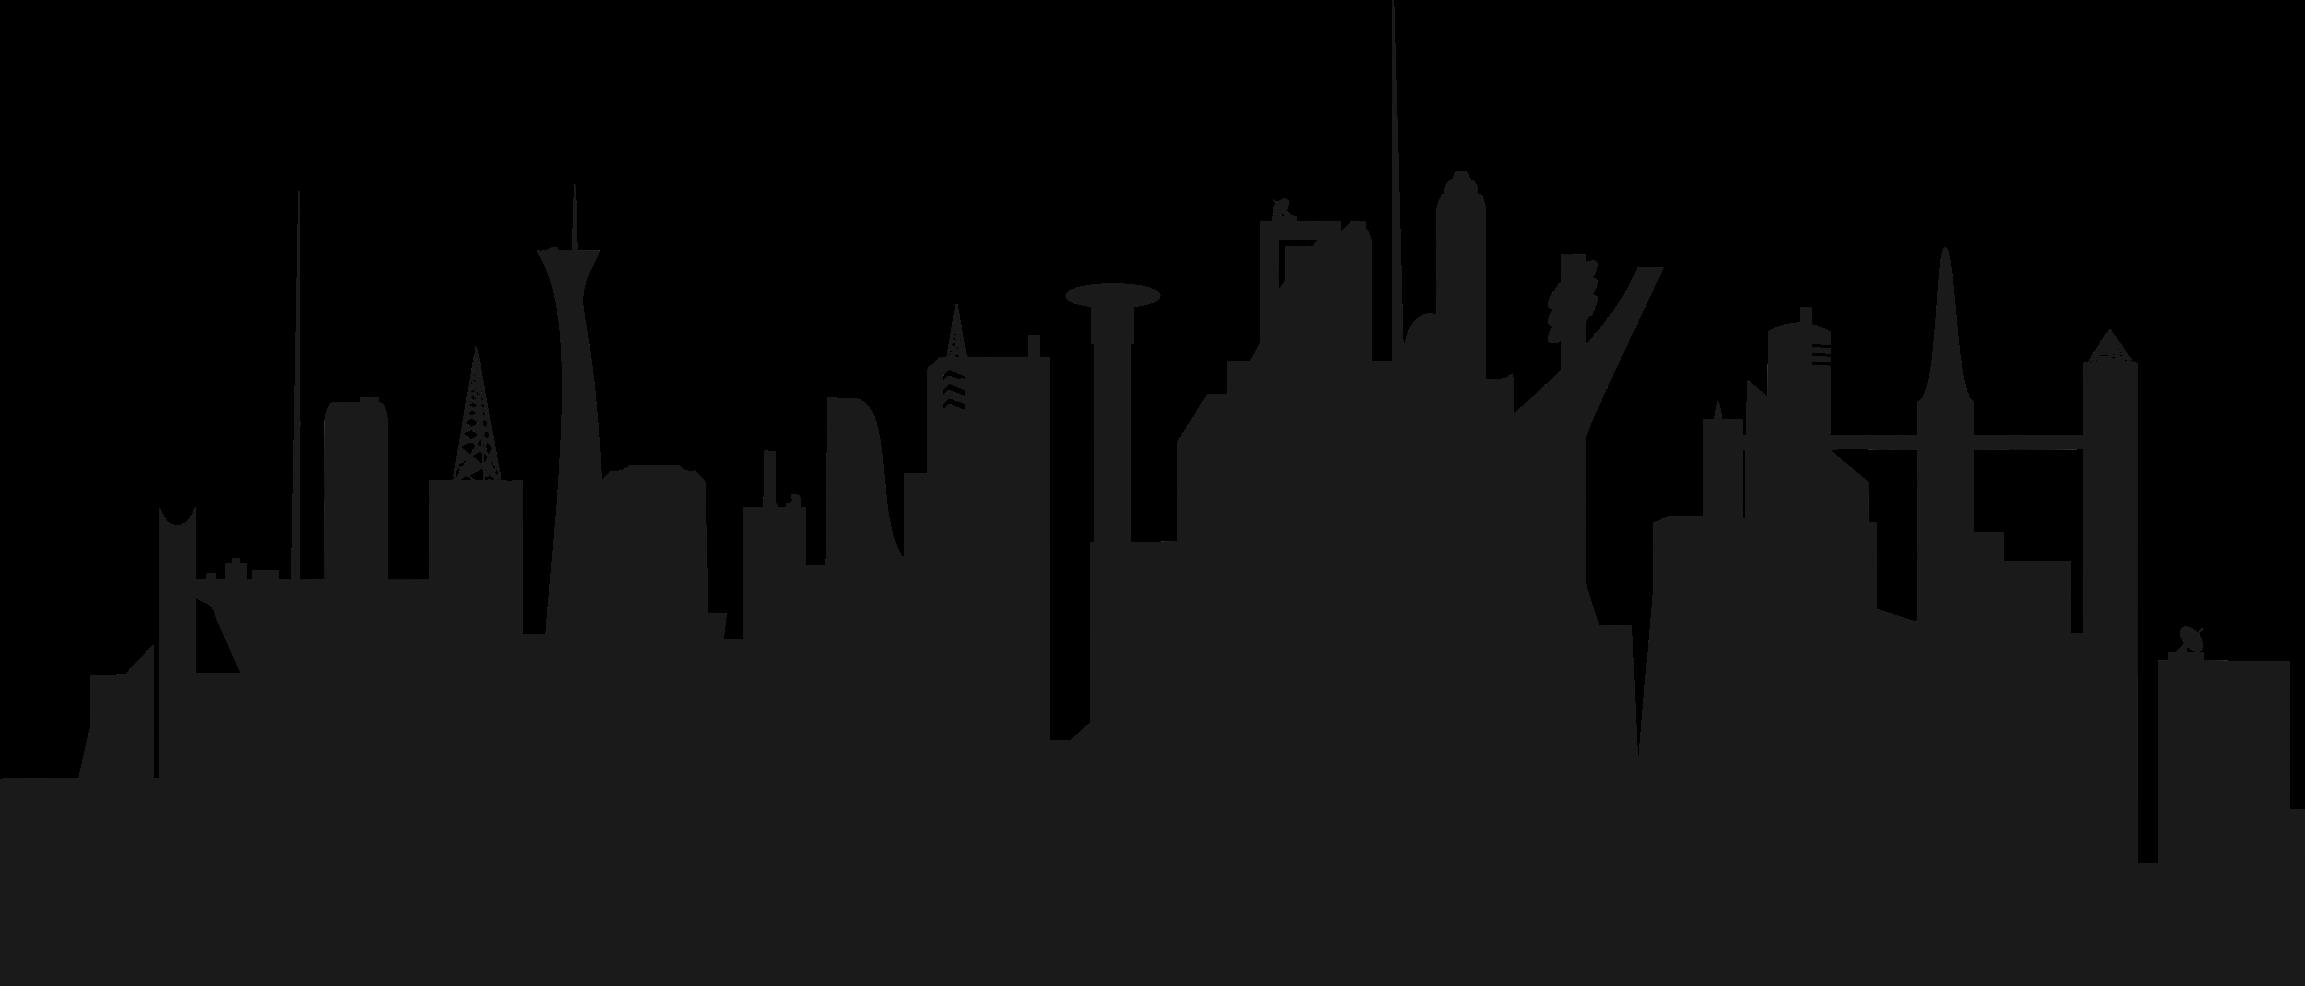 City clipart. New york skyline silhouette